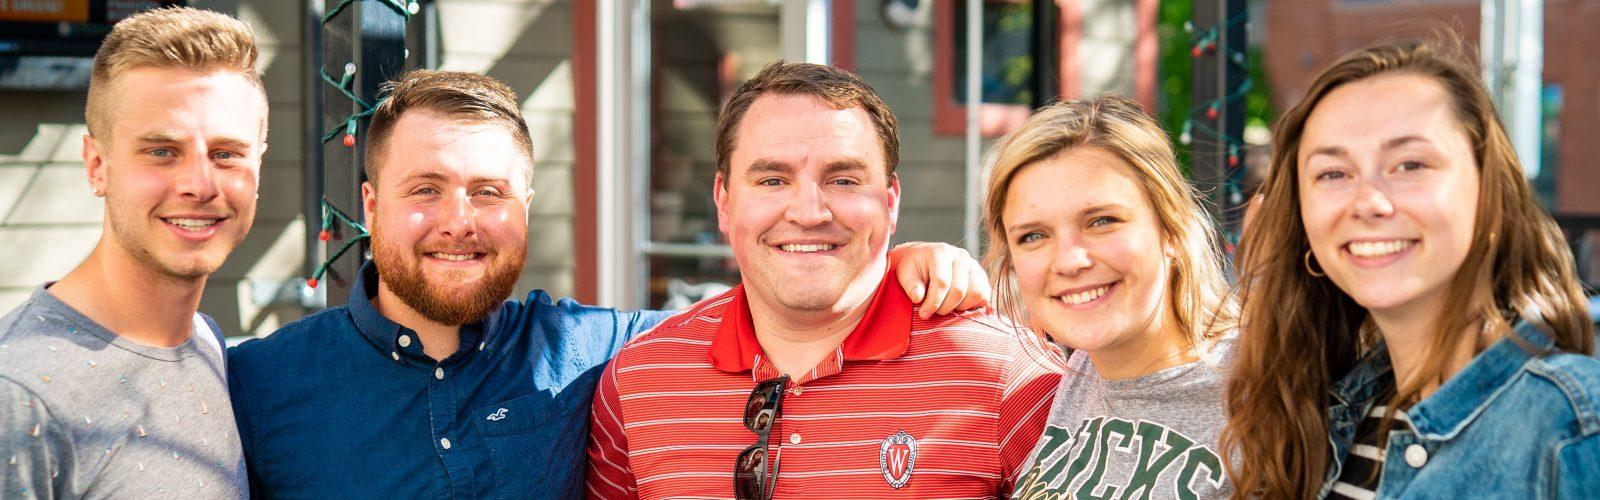 color photo of interns and chad schultz, program supervisor